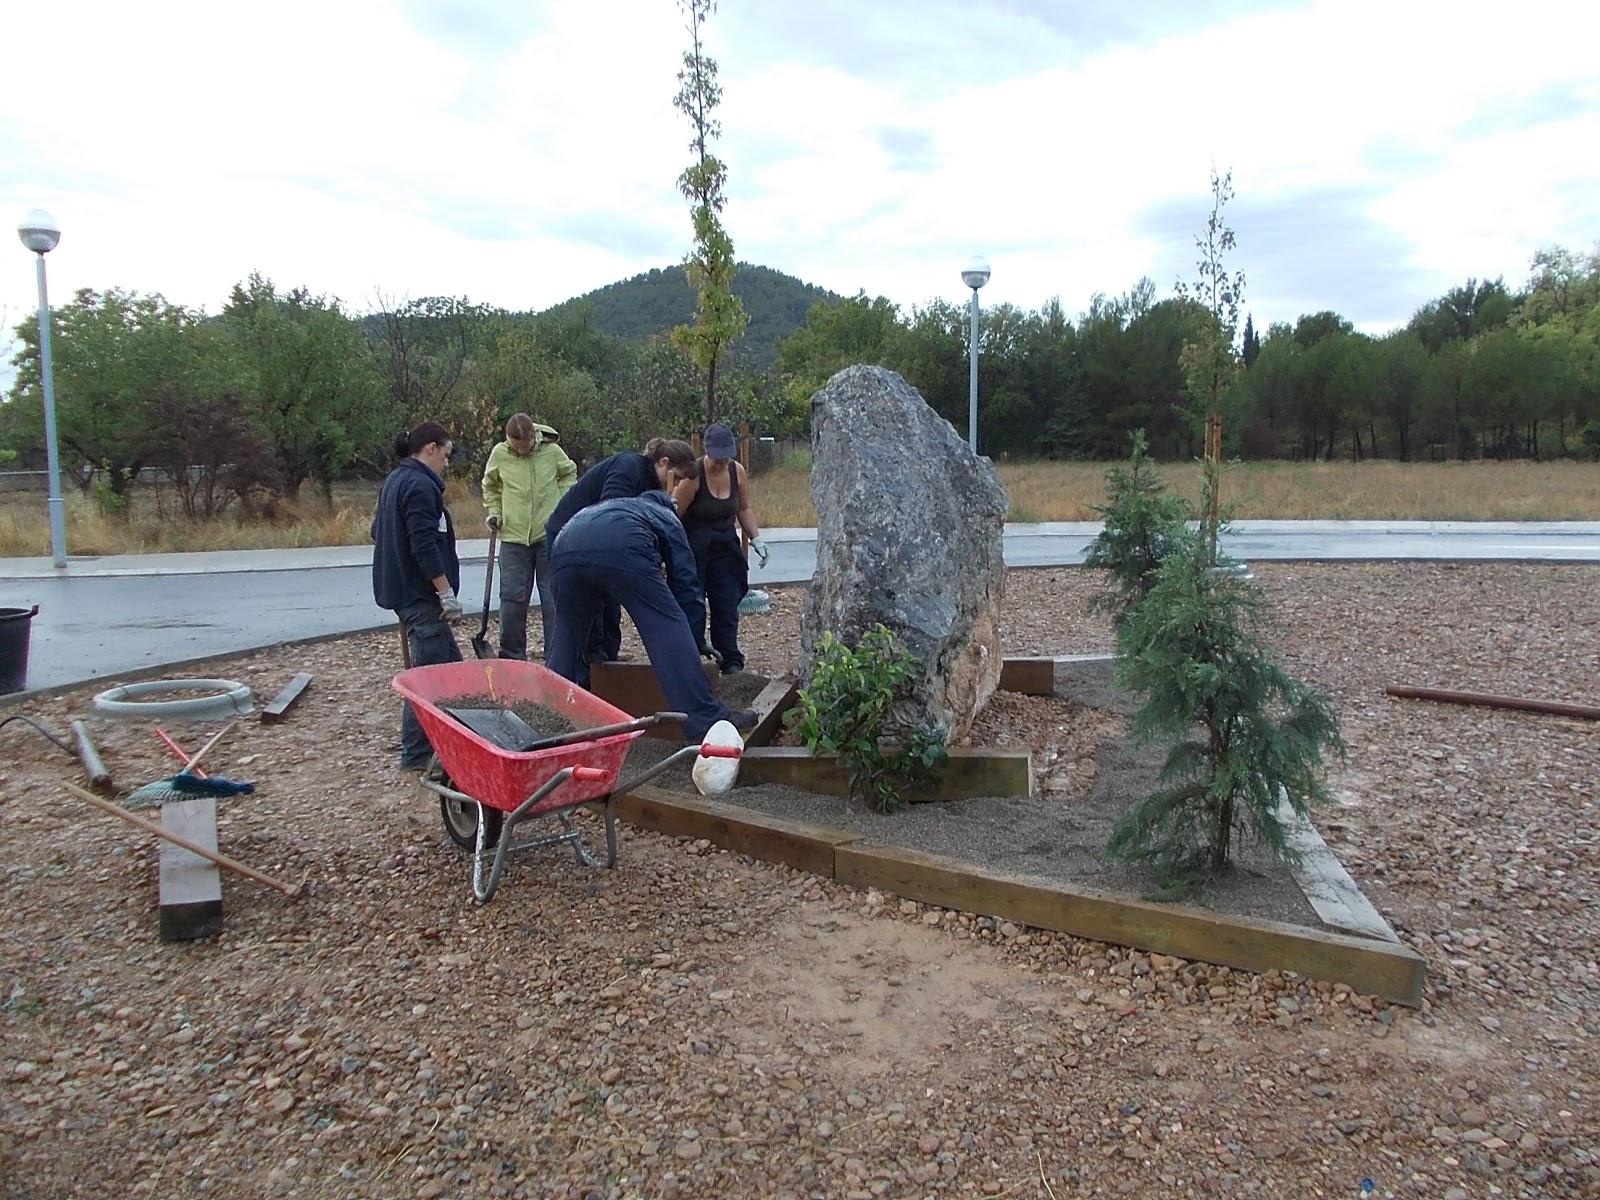 Ayerbe taller de empleo jardineria glorieta rabad y navarro for Jardineria navarro